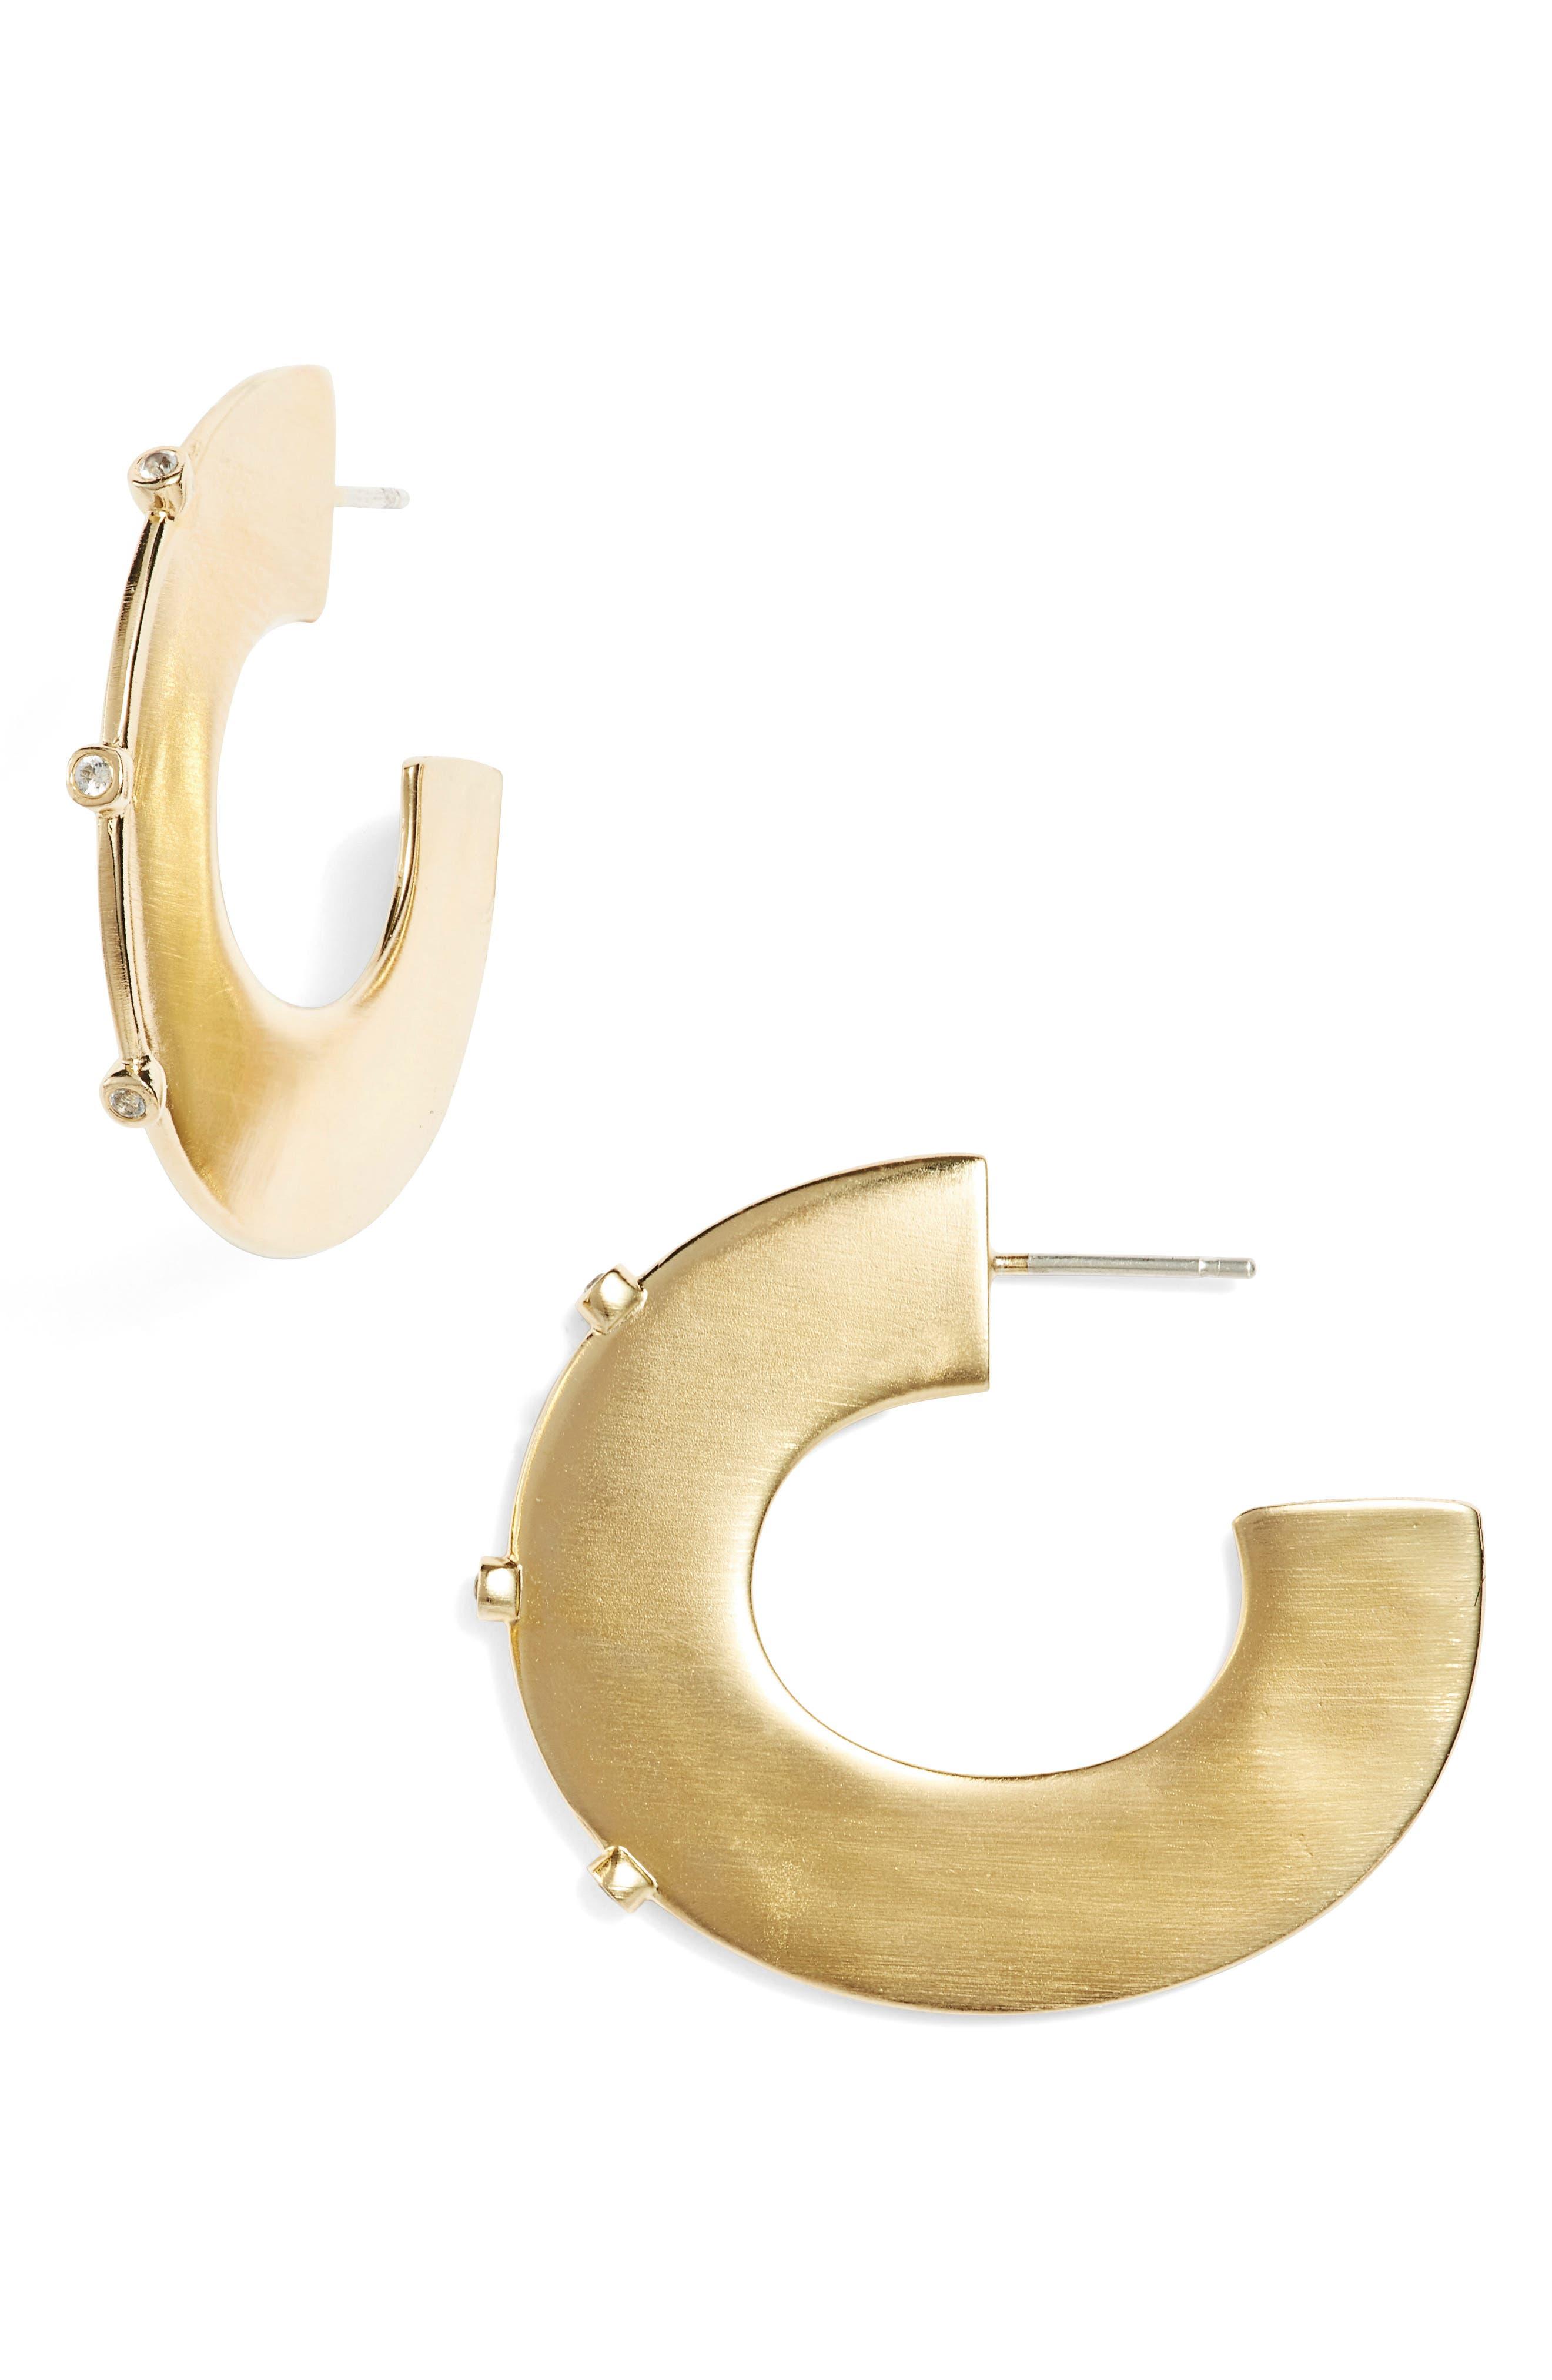 Main Image - Elizabeth and James Sullivan - Joni White Topaz Hoop Earrings